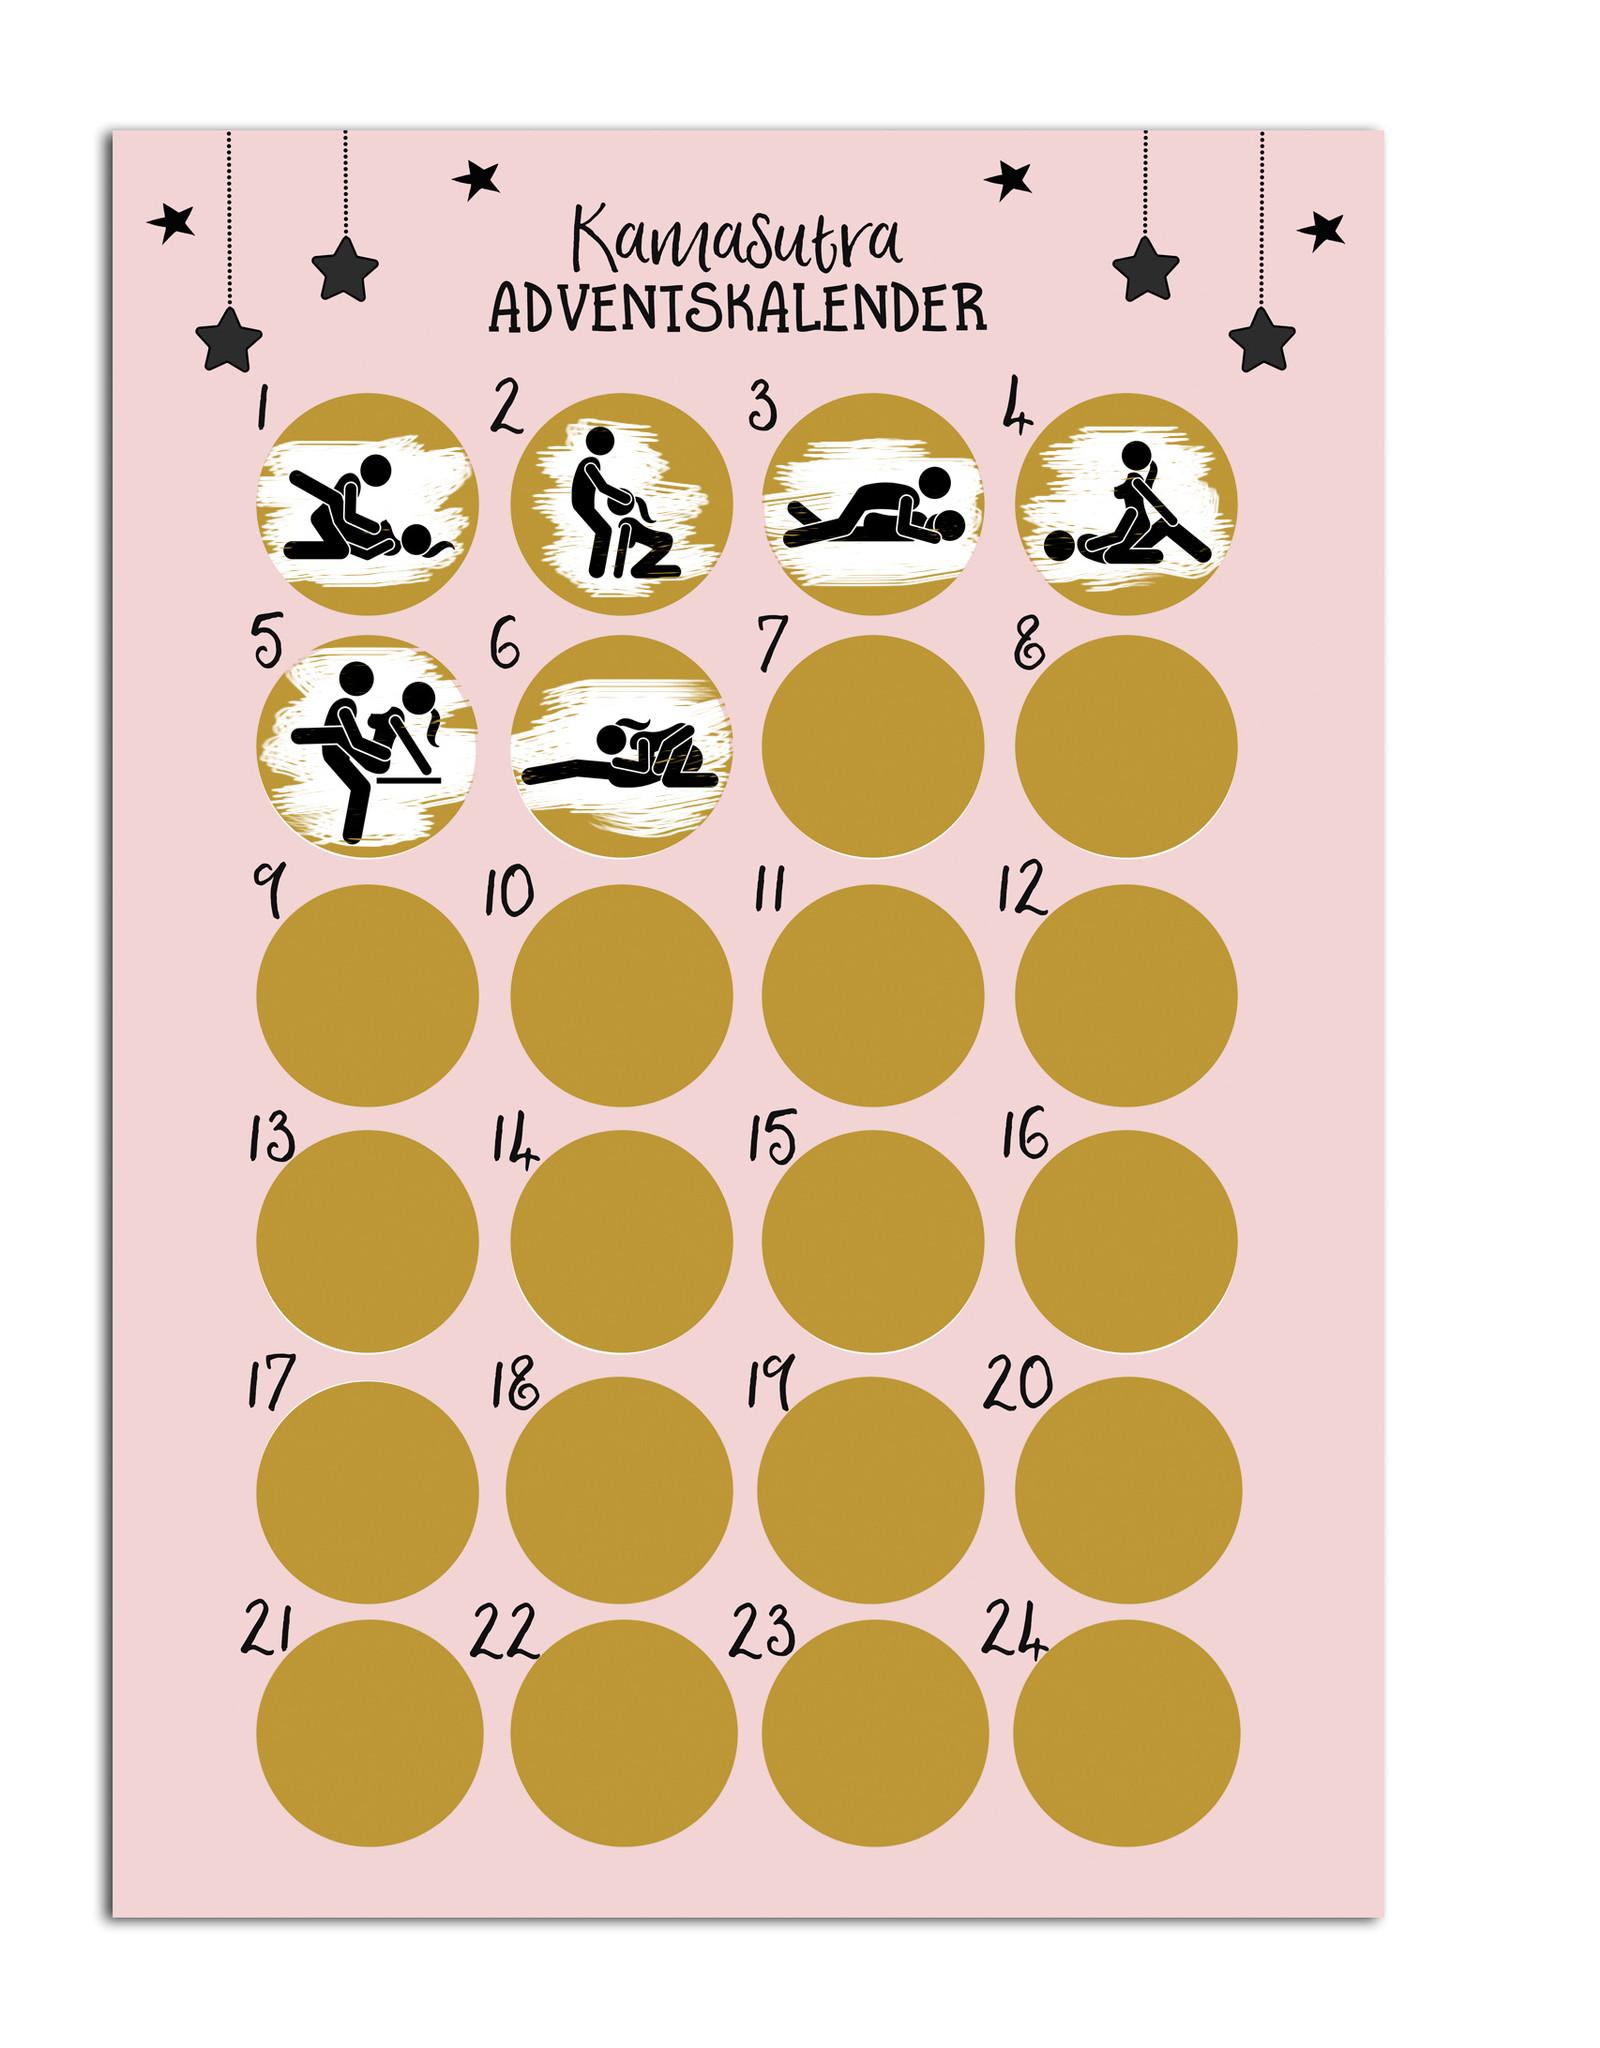 Adventskalender zum Rubbeln KAMASUTRA Adventskalender A3 Weihnachtskalender